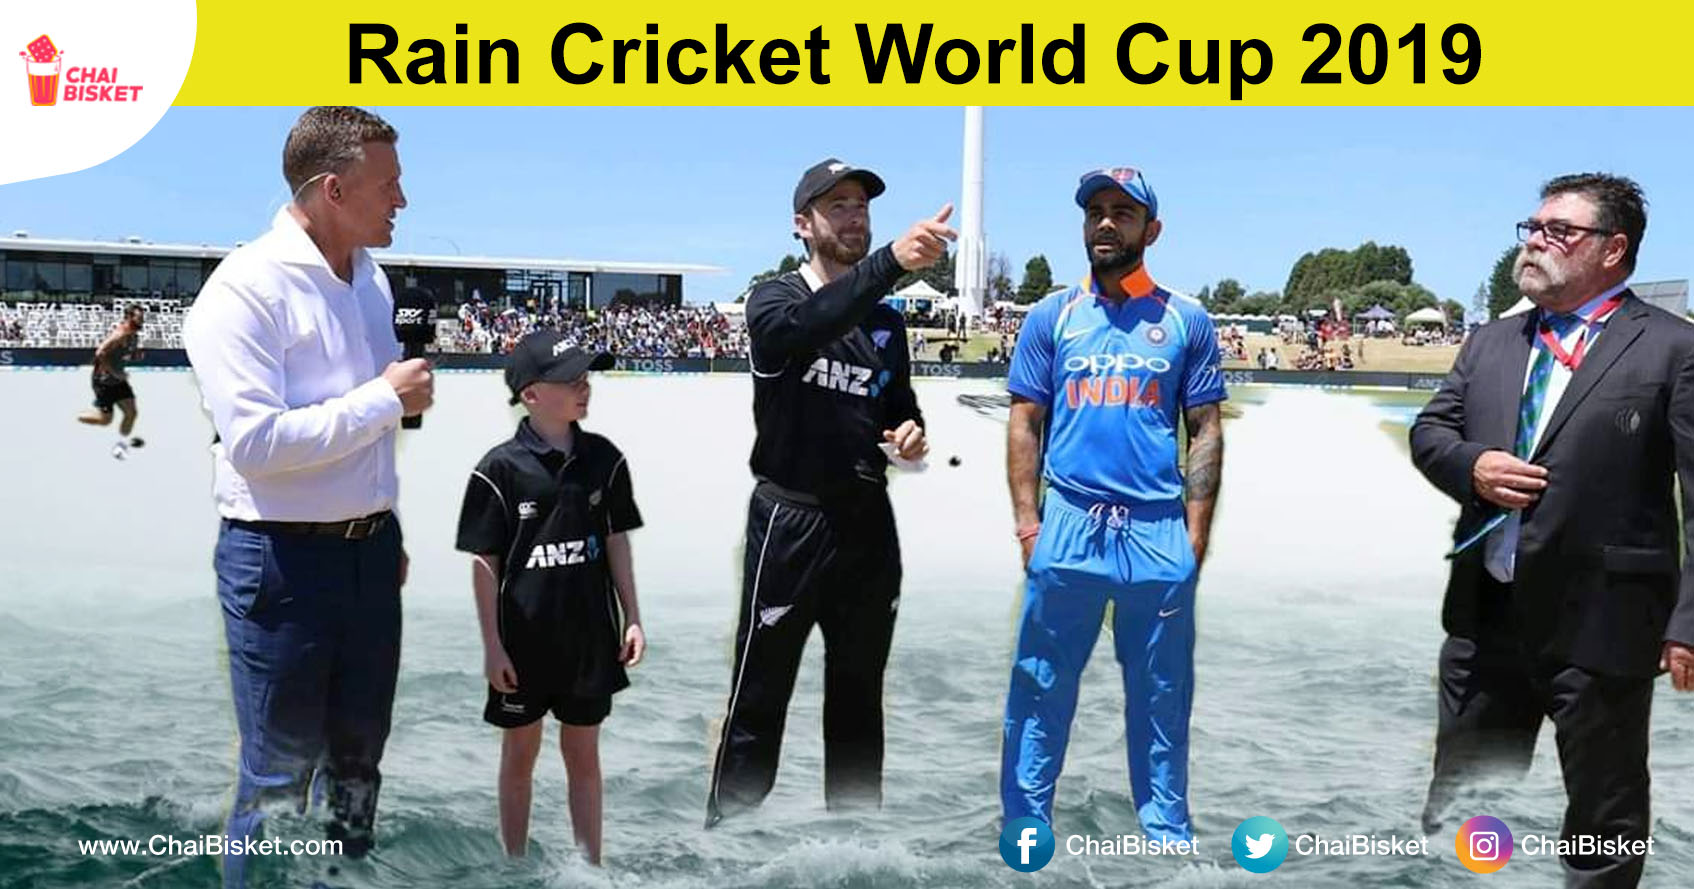 Image result for worldcup raining cricket meme